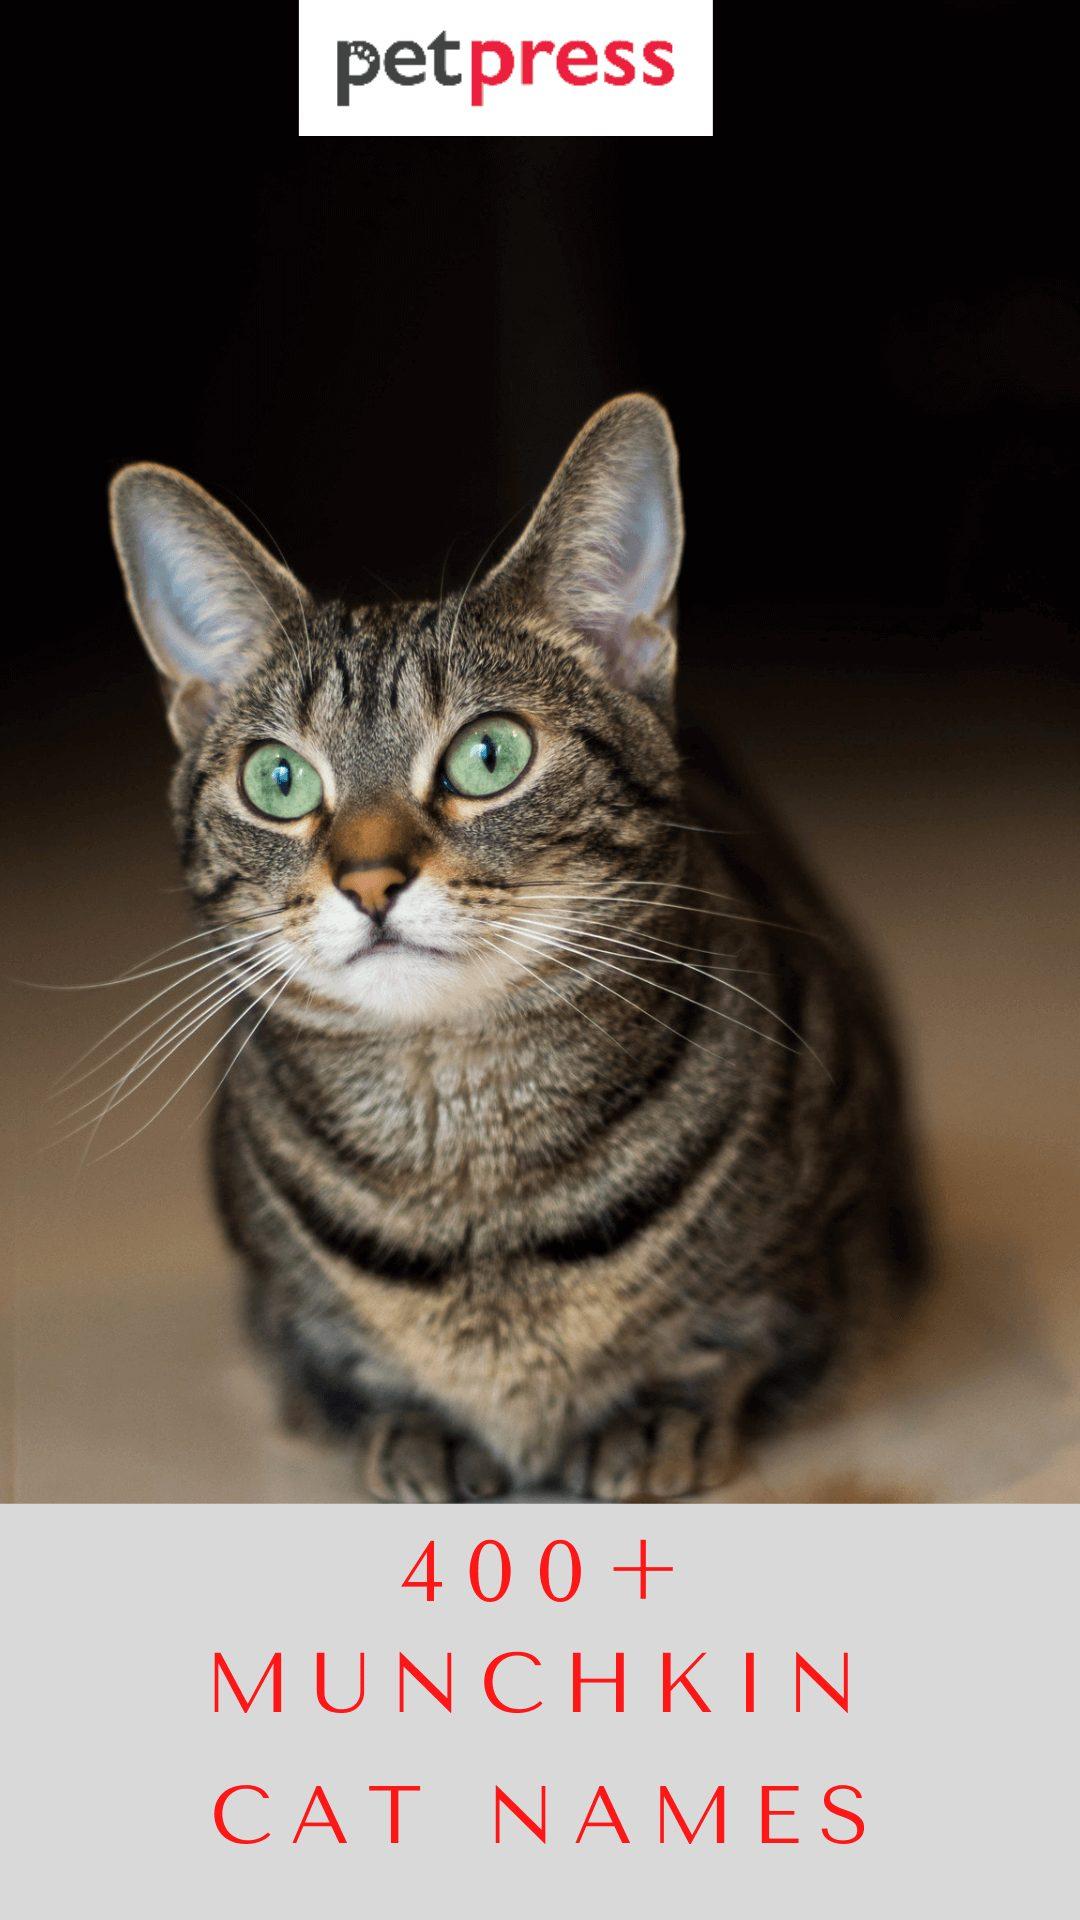 munchkin-cat-names